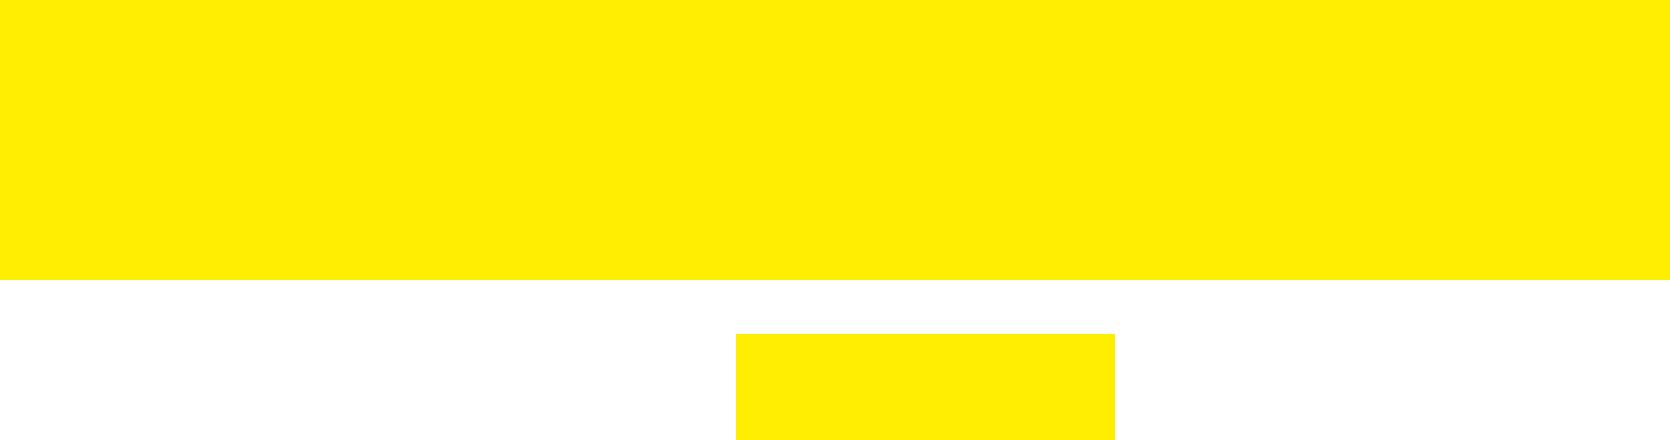 Seestadt-Saga